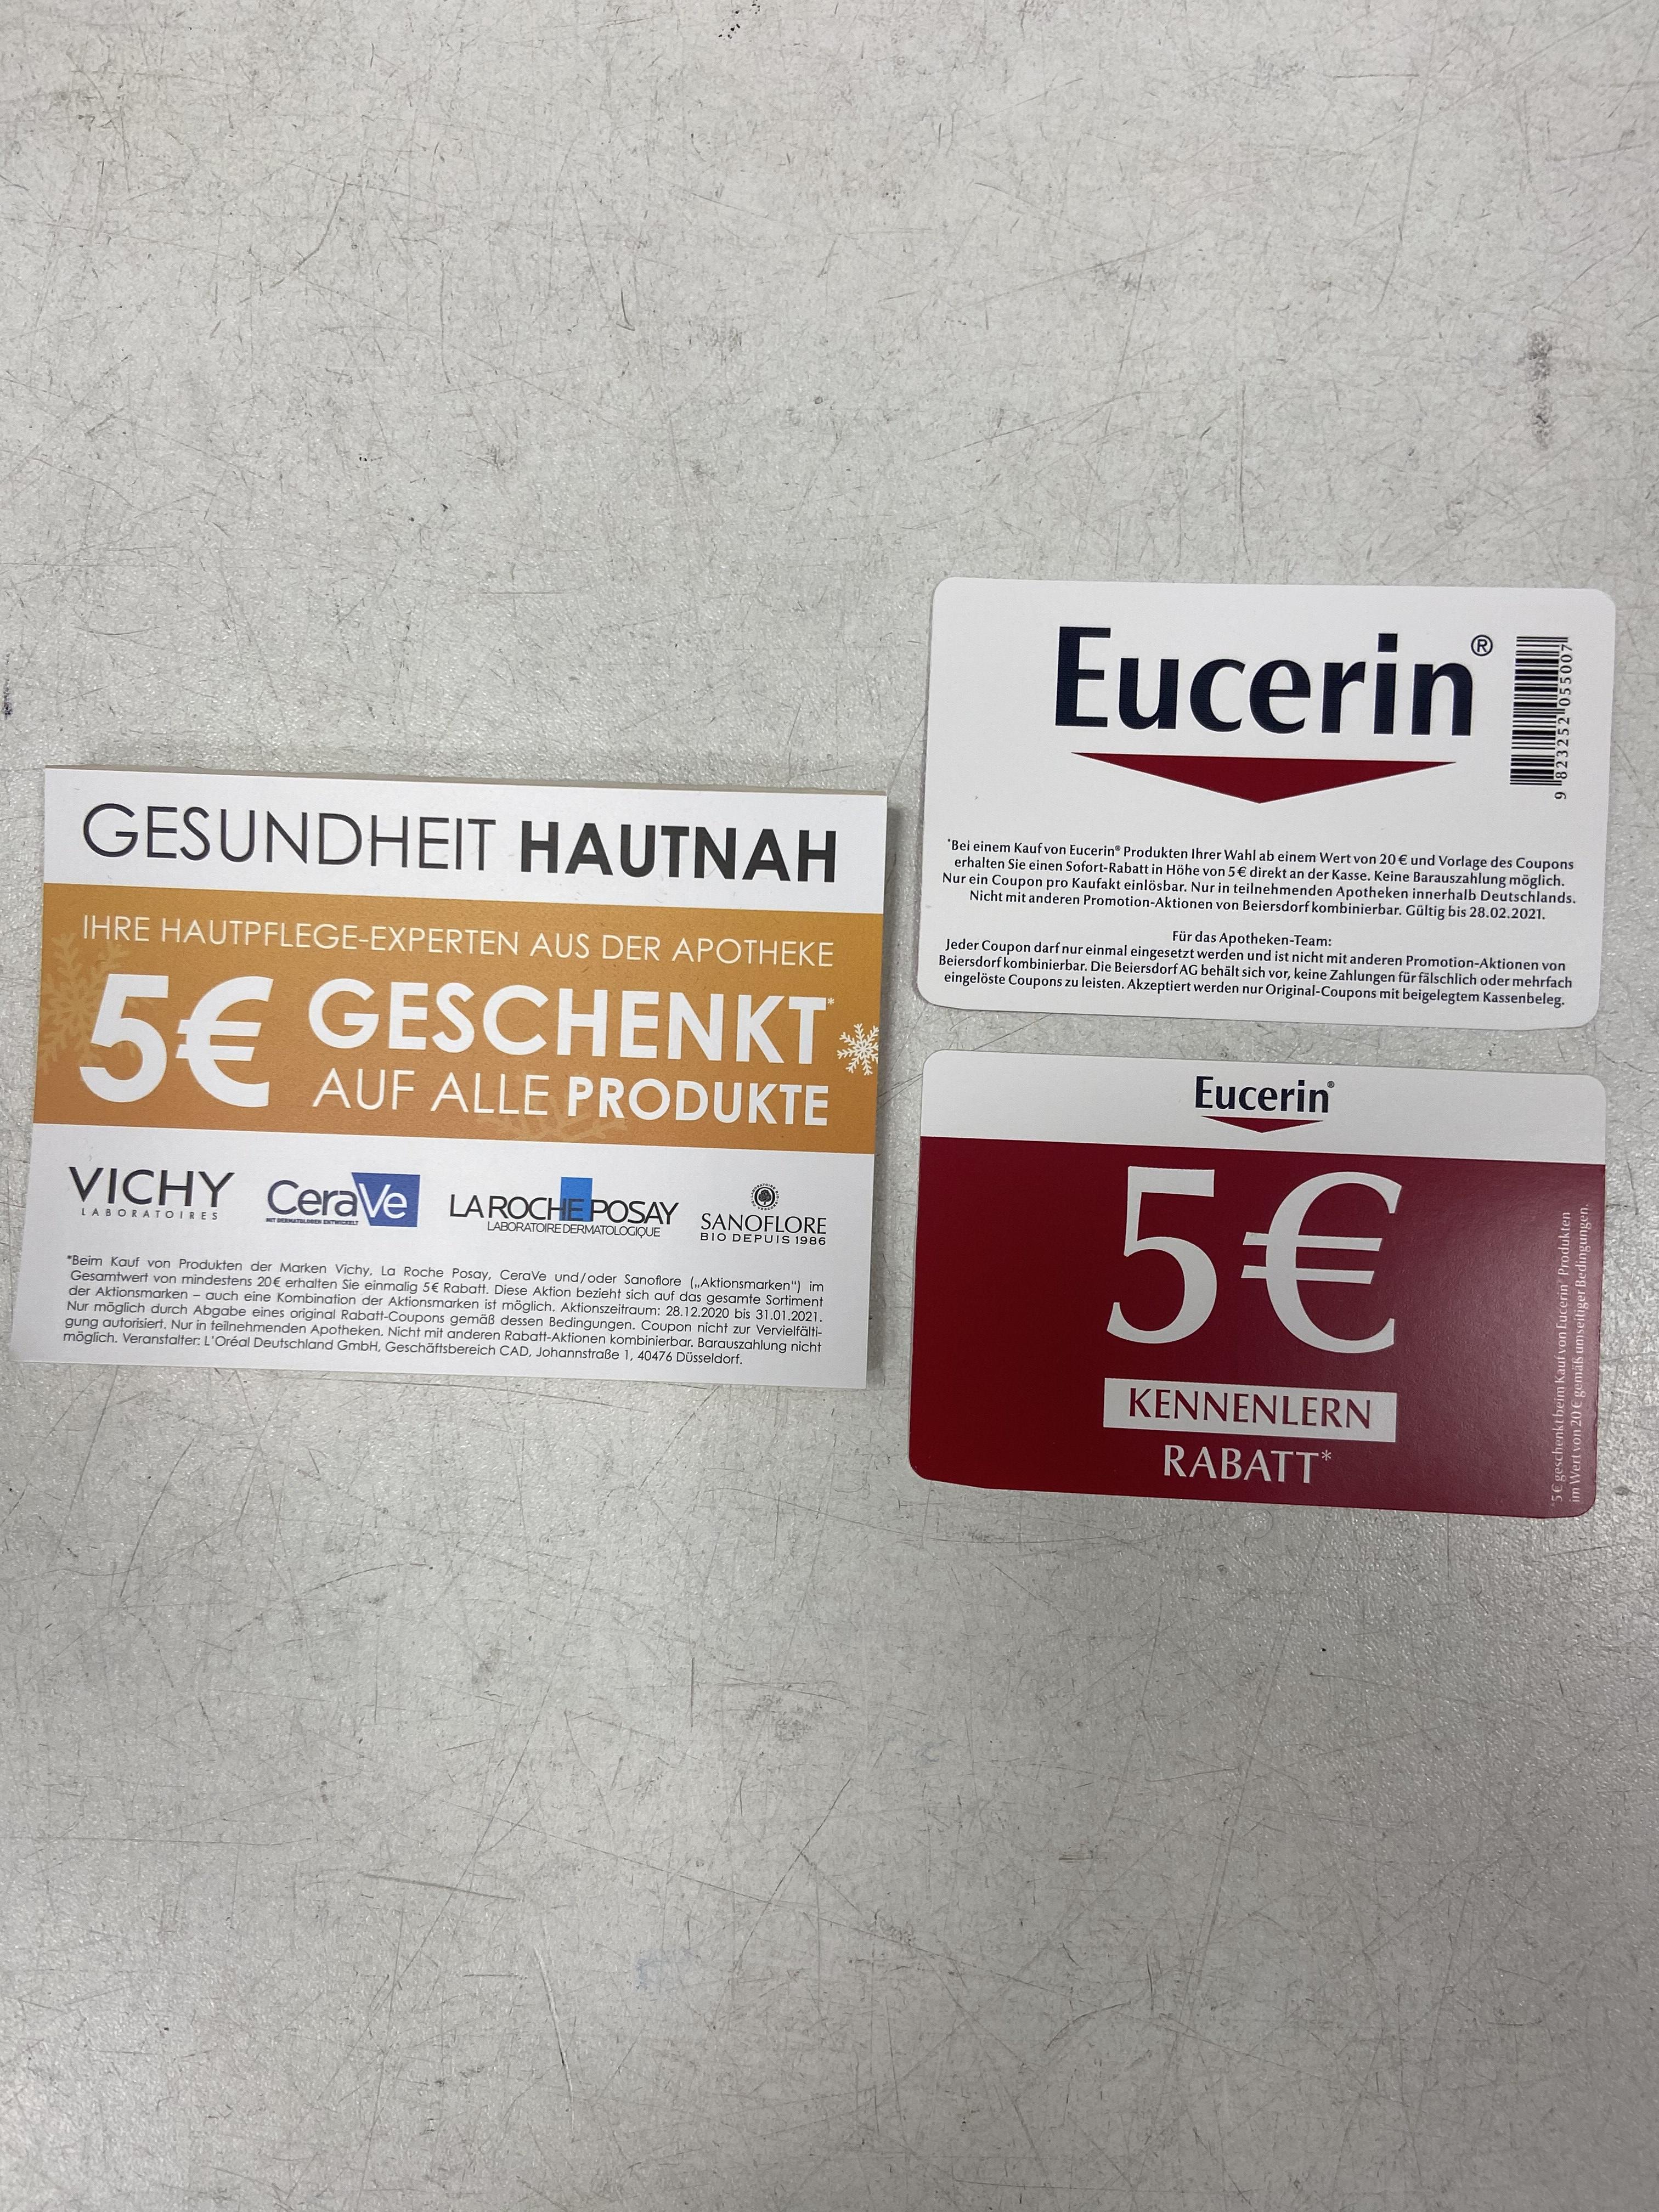 5€ Rabatt (20€ MEW) auf Eucerin, Vichy, CeraVe, etc. in Apotheken